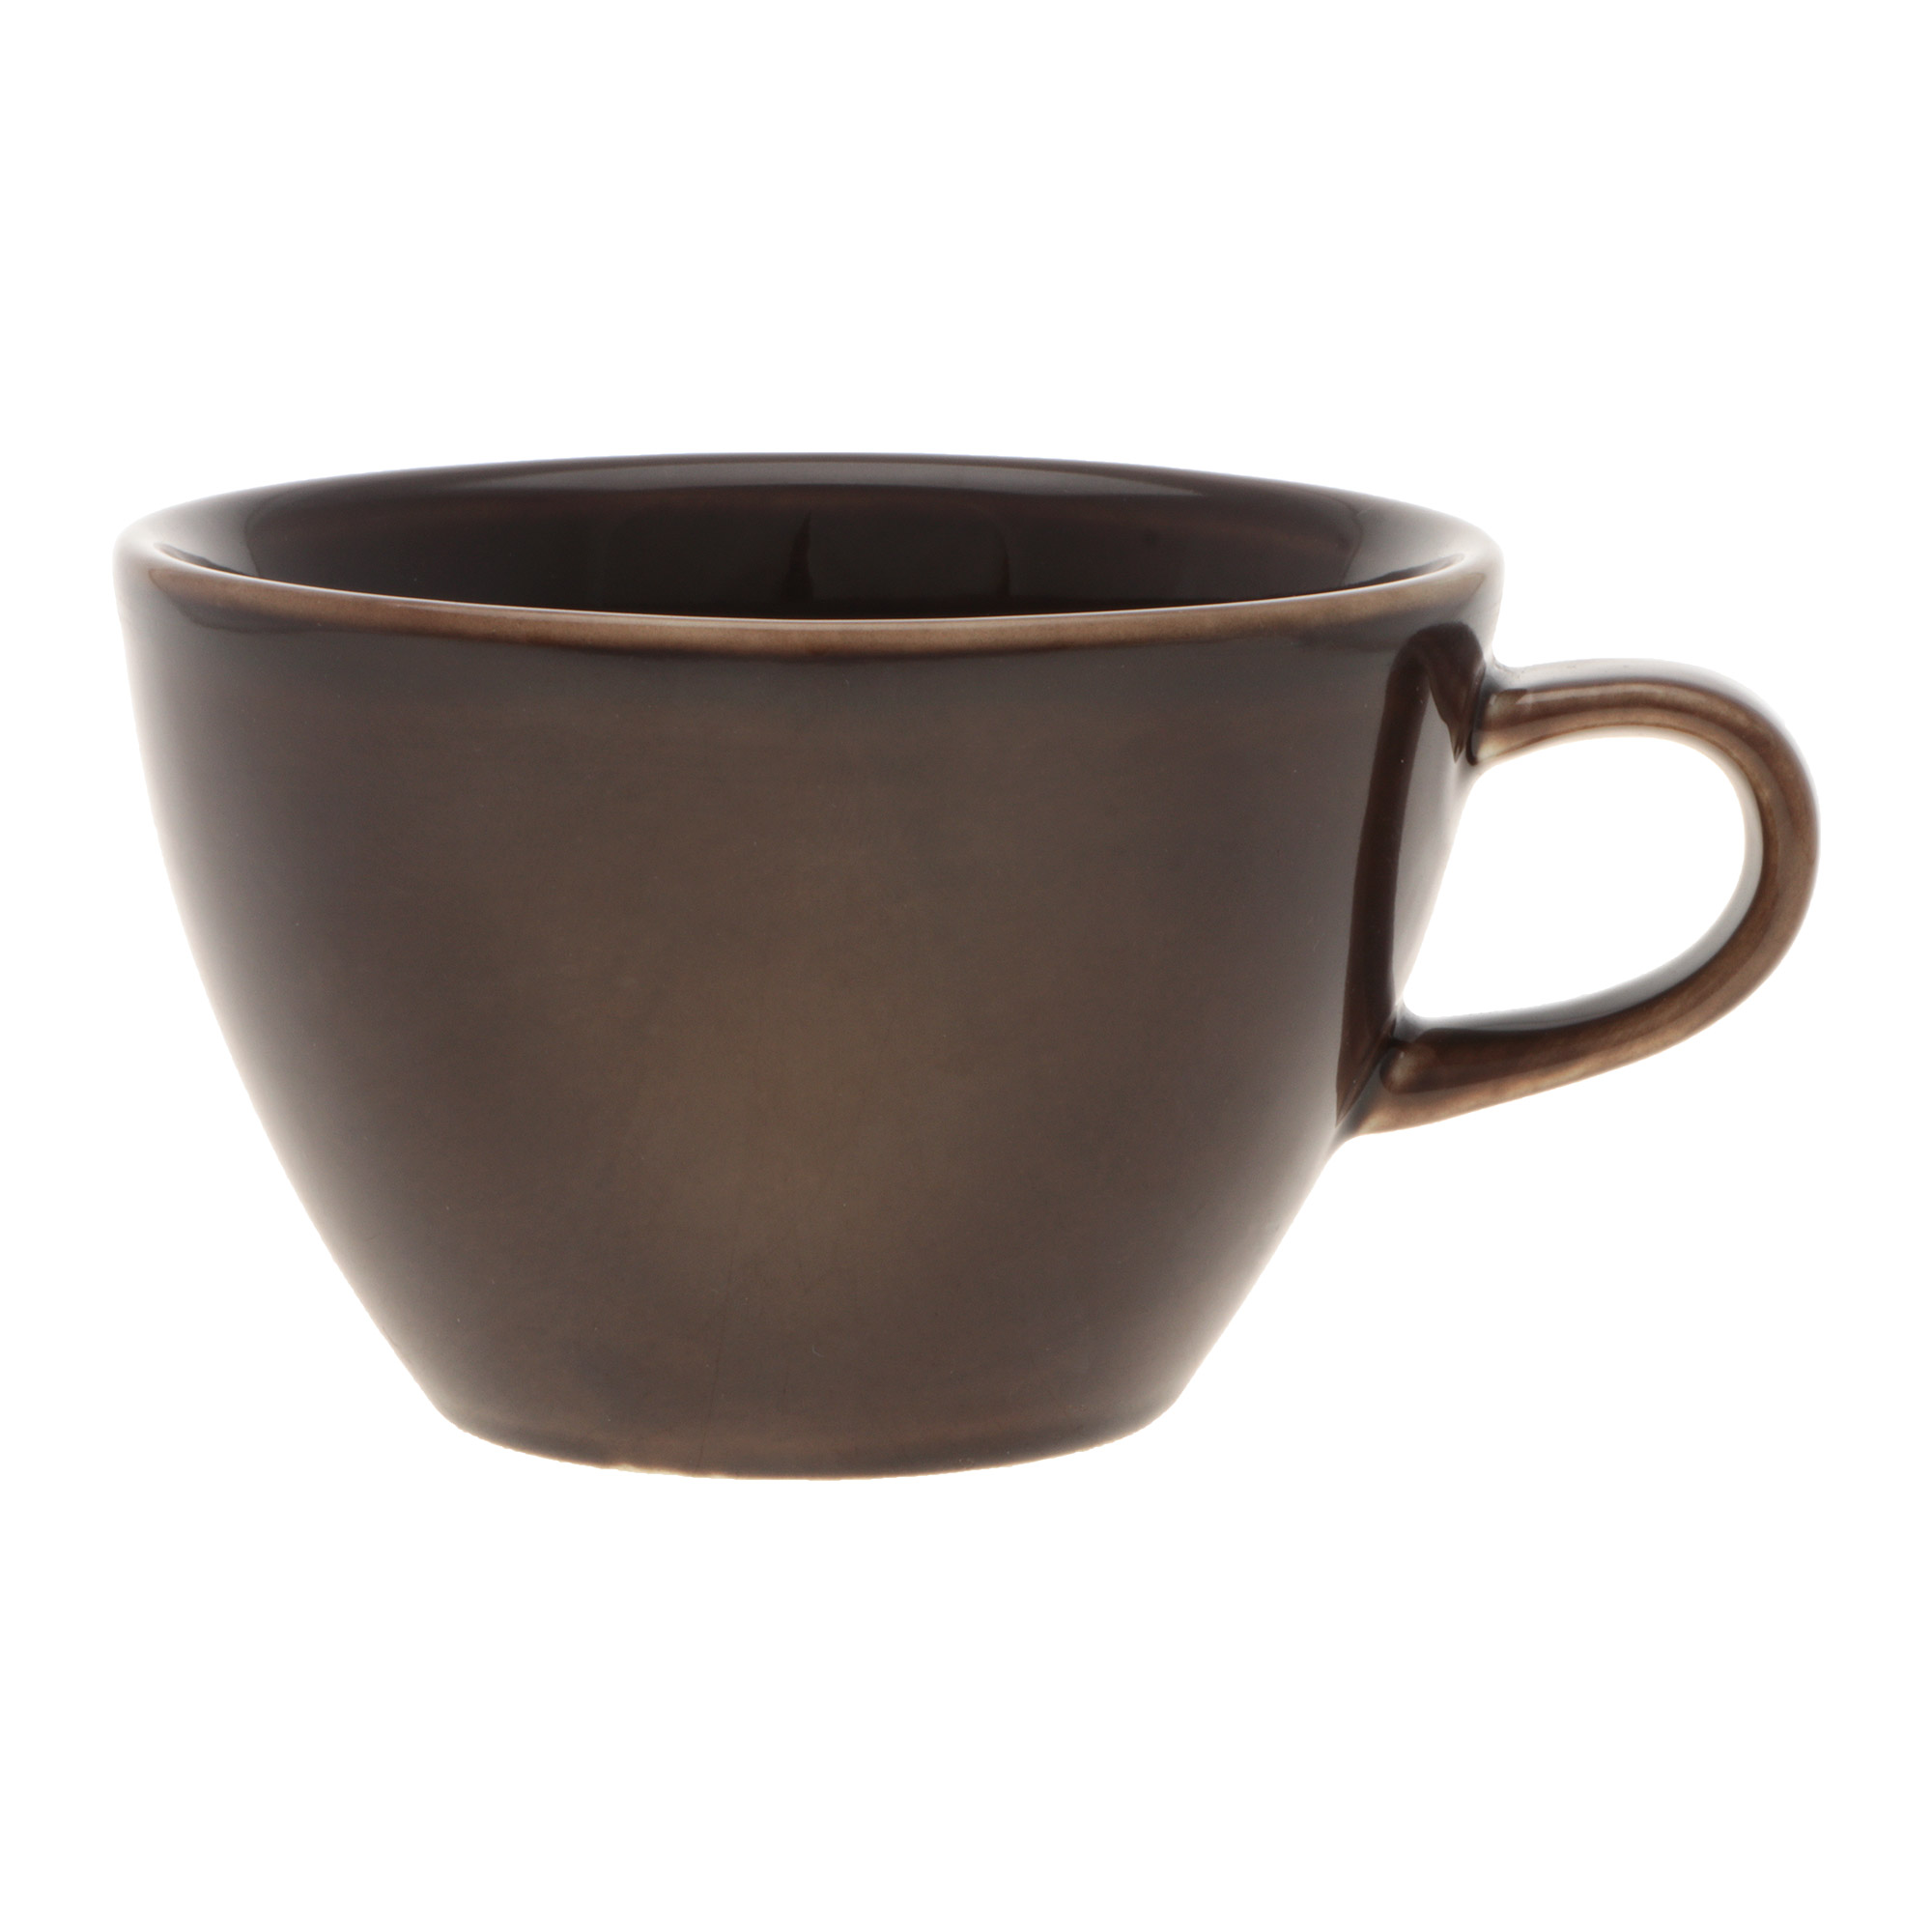 Чашка кофейная Башкирский фарфор Профи 210 мл коричневый